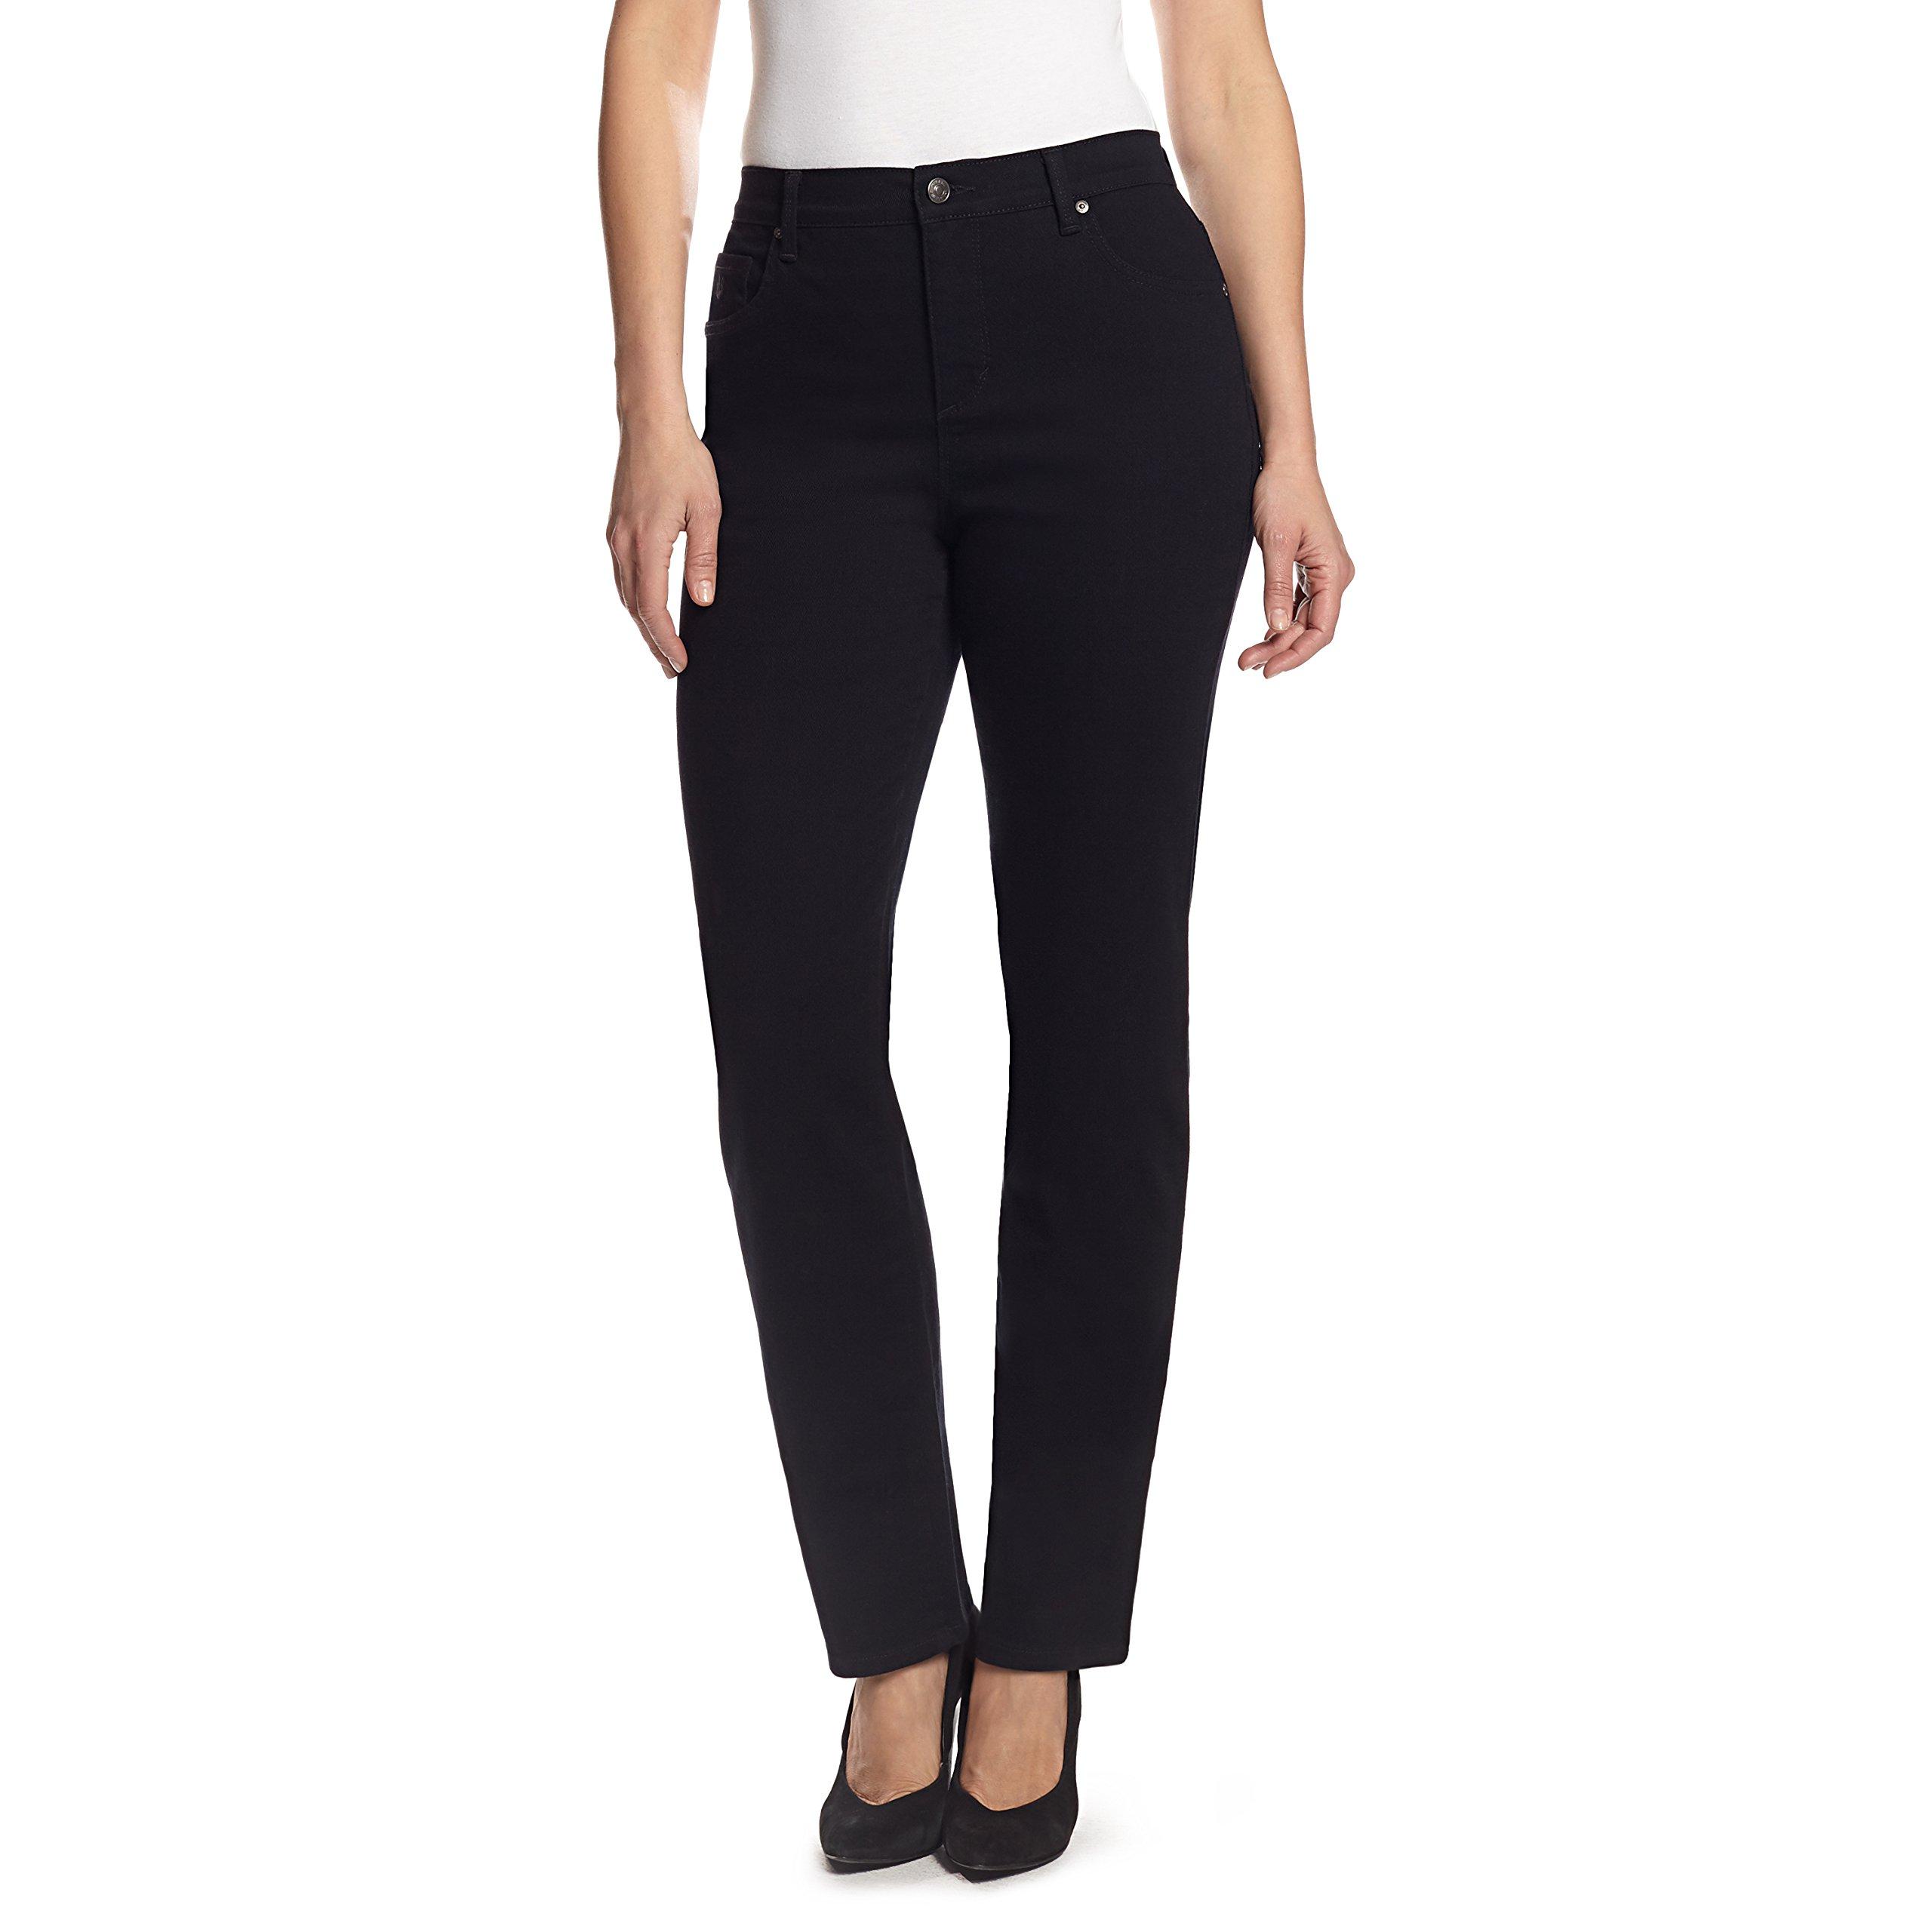 86d489eb007 Gloria Vanderbilt Women s Plus Size Amanda Classic Tapered Jean ...